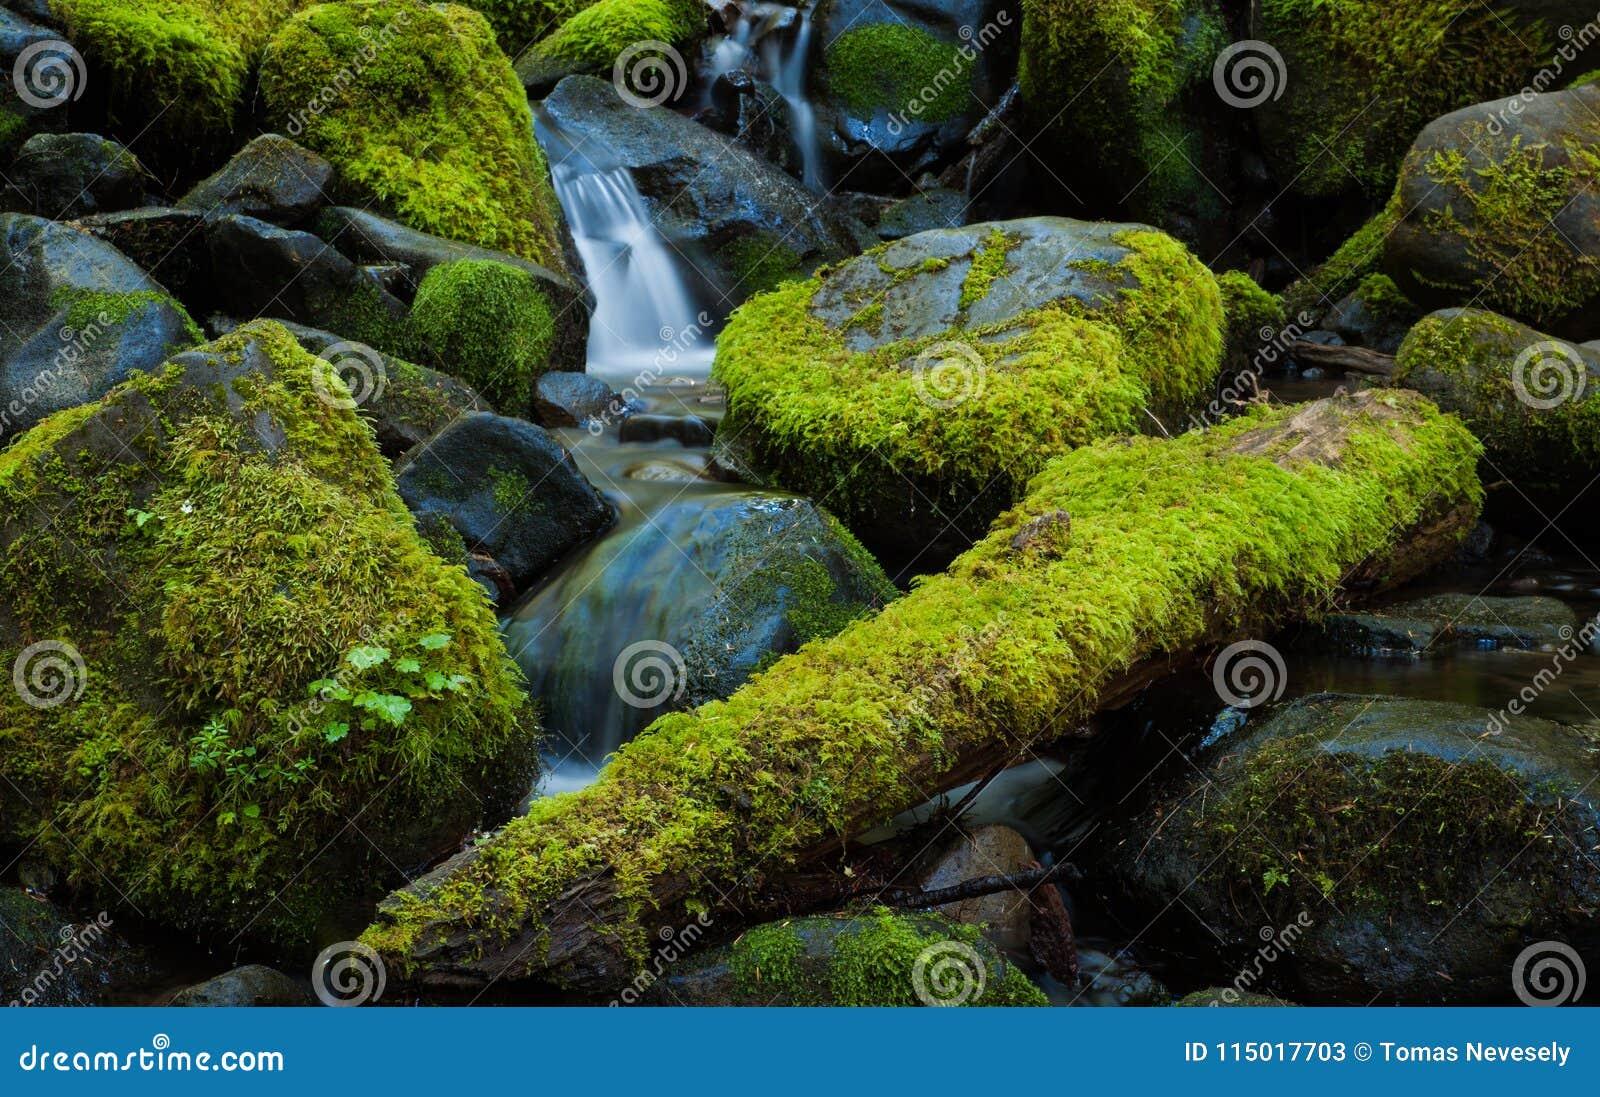 Moss Covered Rocks In A Mountain Stream, Washington Stock